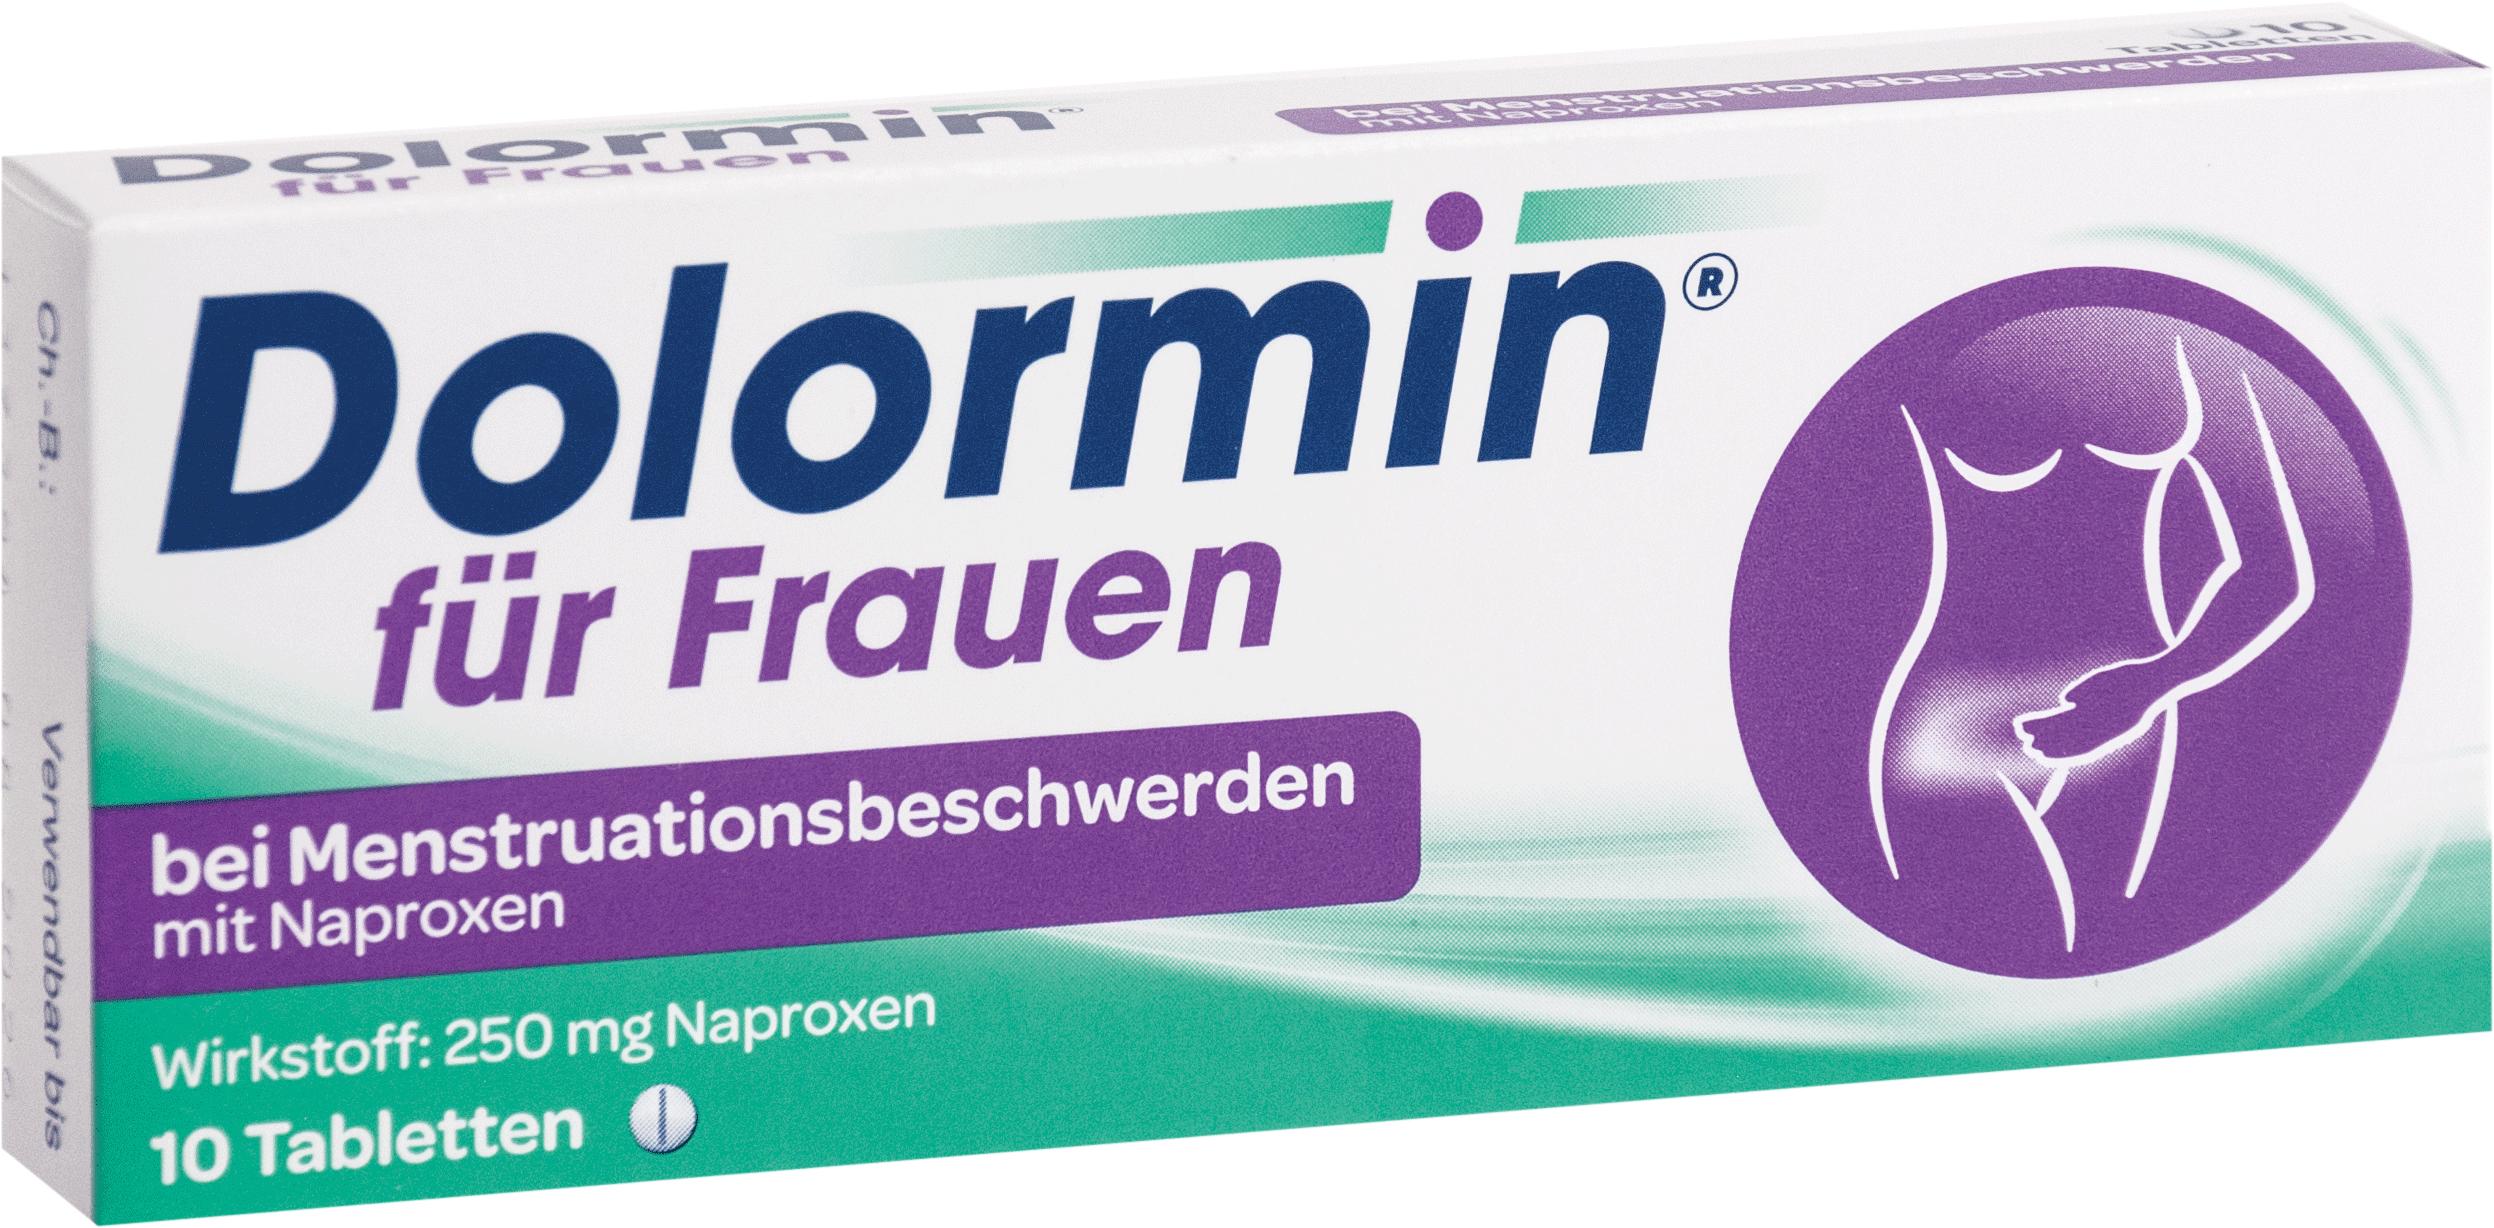 Dolormin f.Frauen bei Menstr.beschw. m. Naproxen